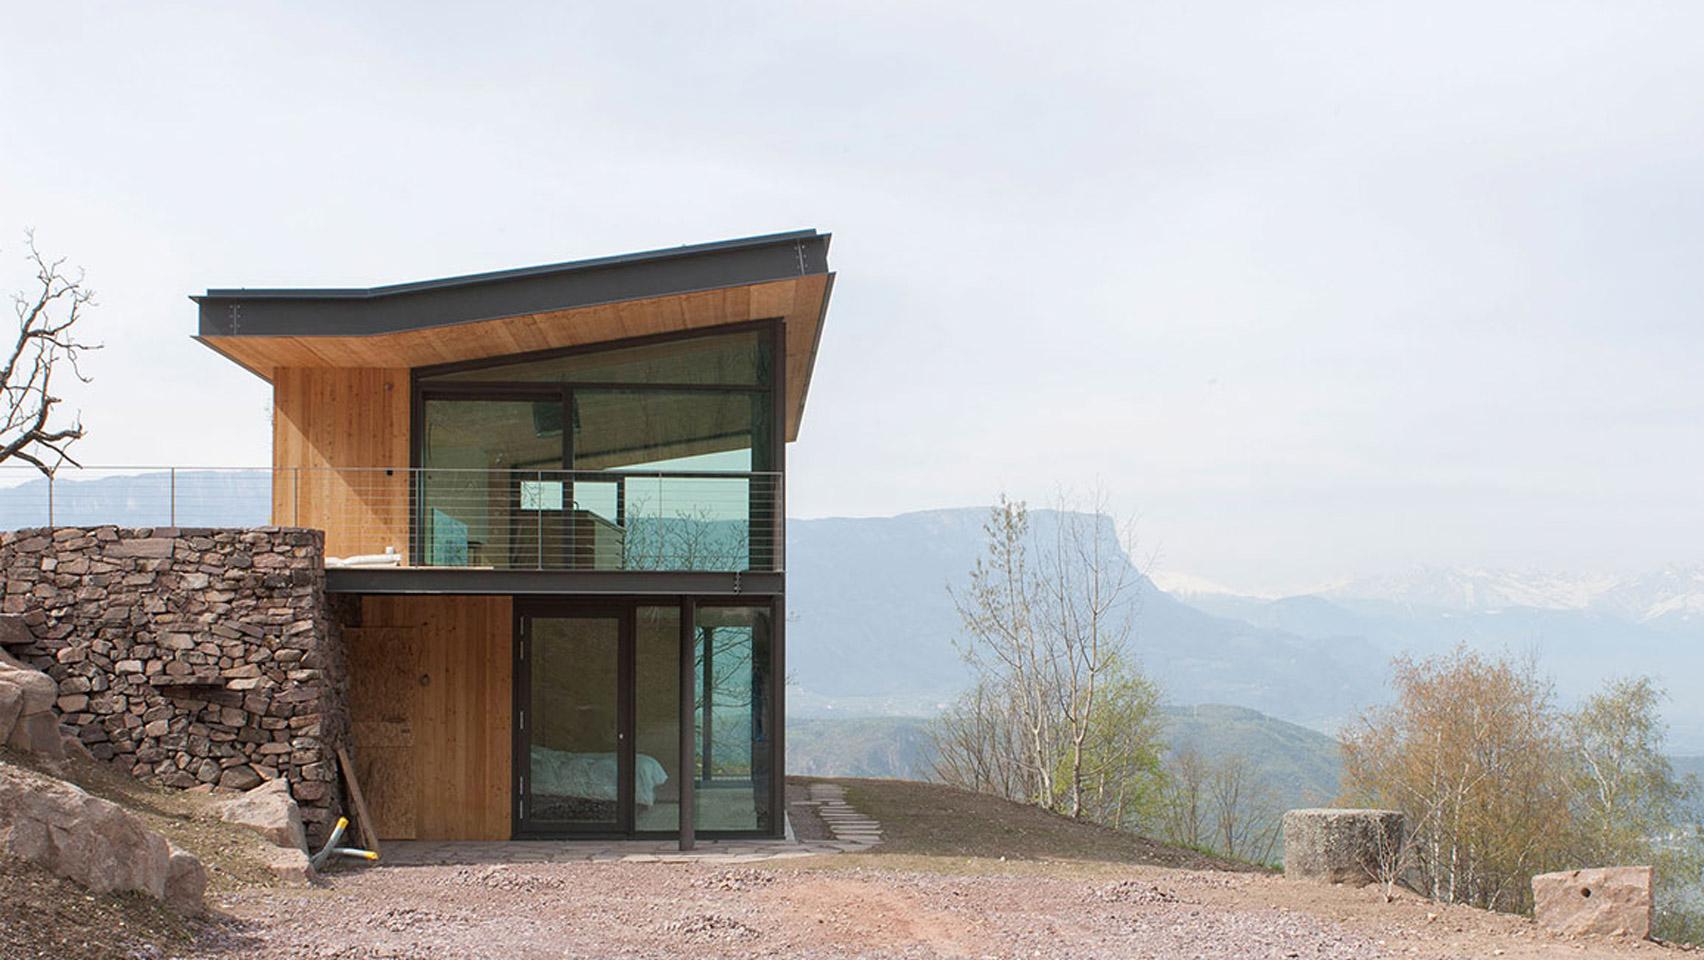 Mountain retreat by Modostudio